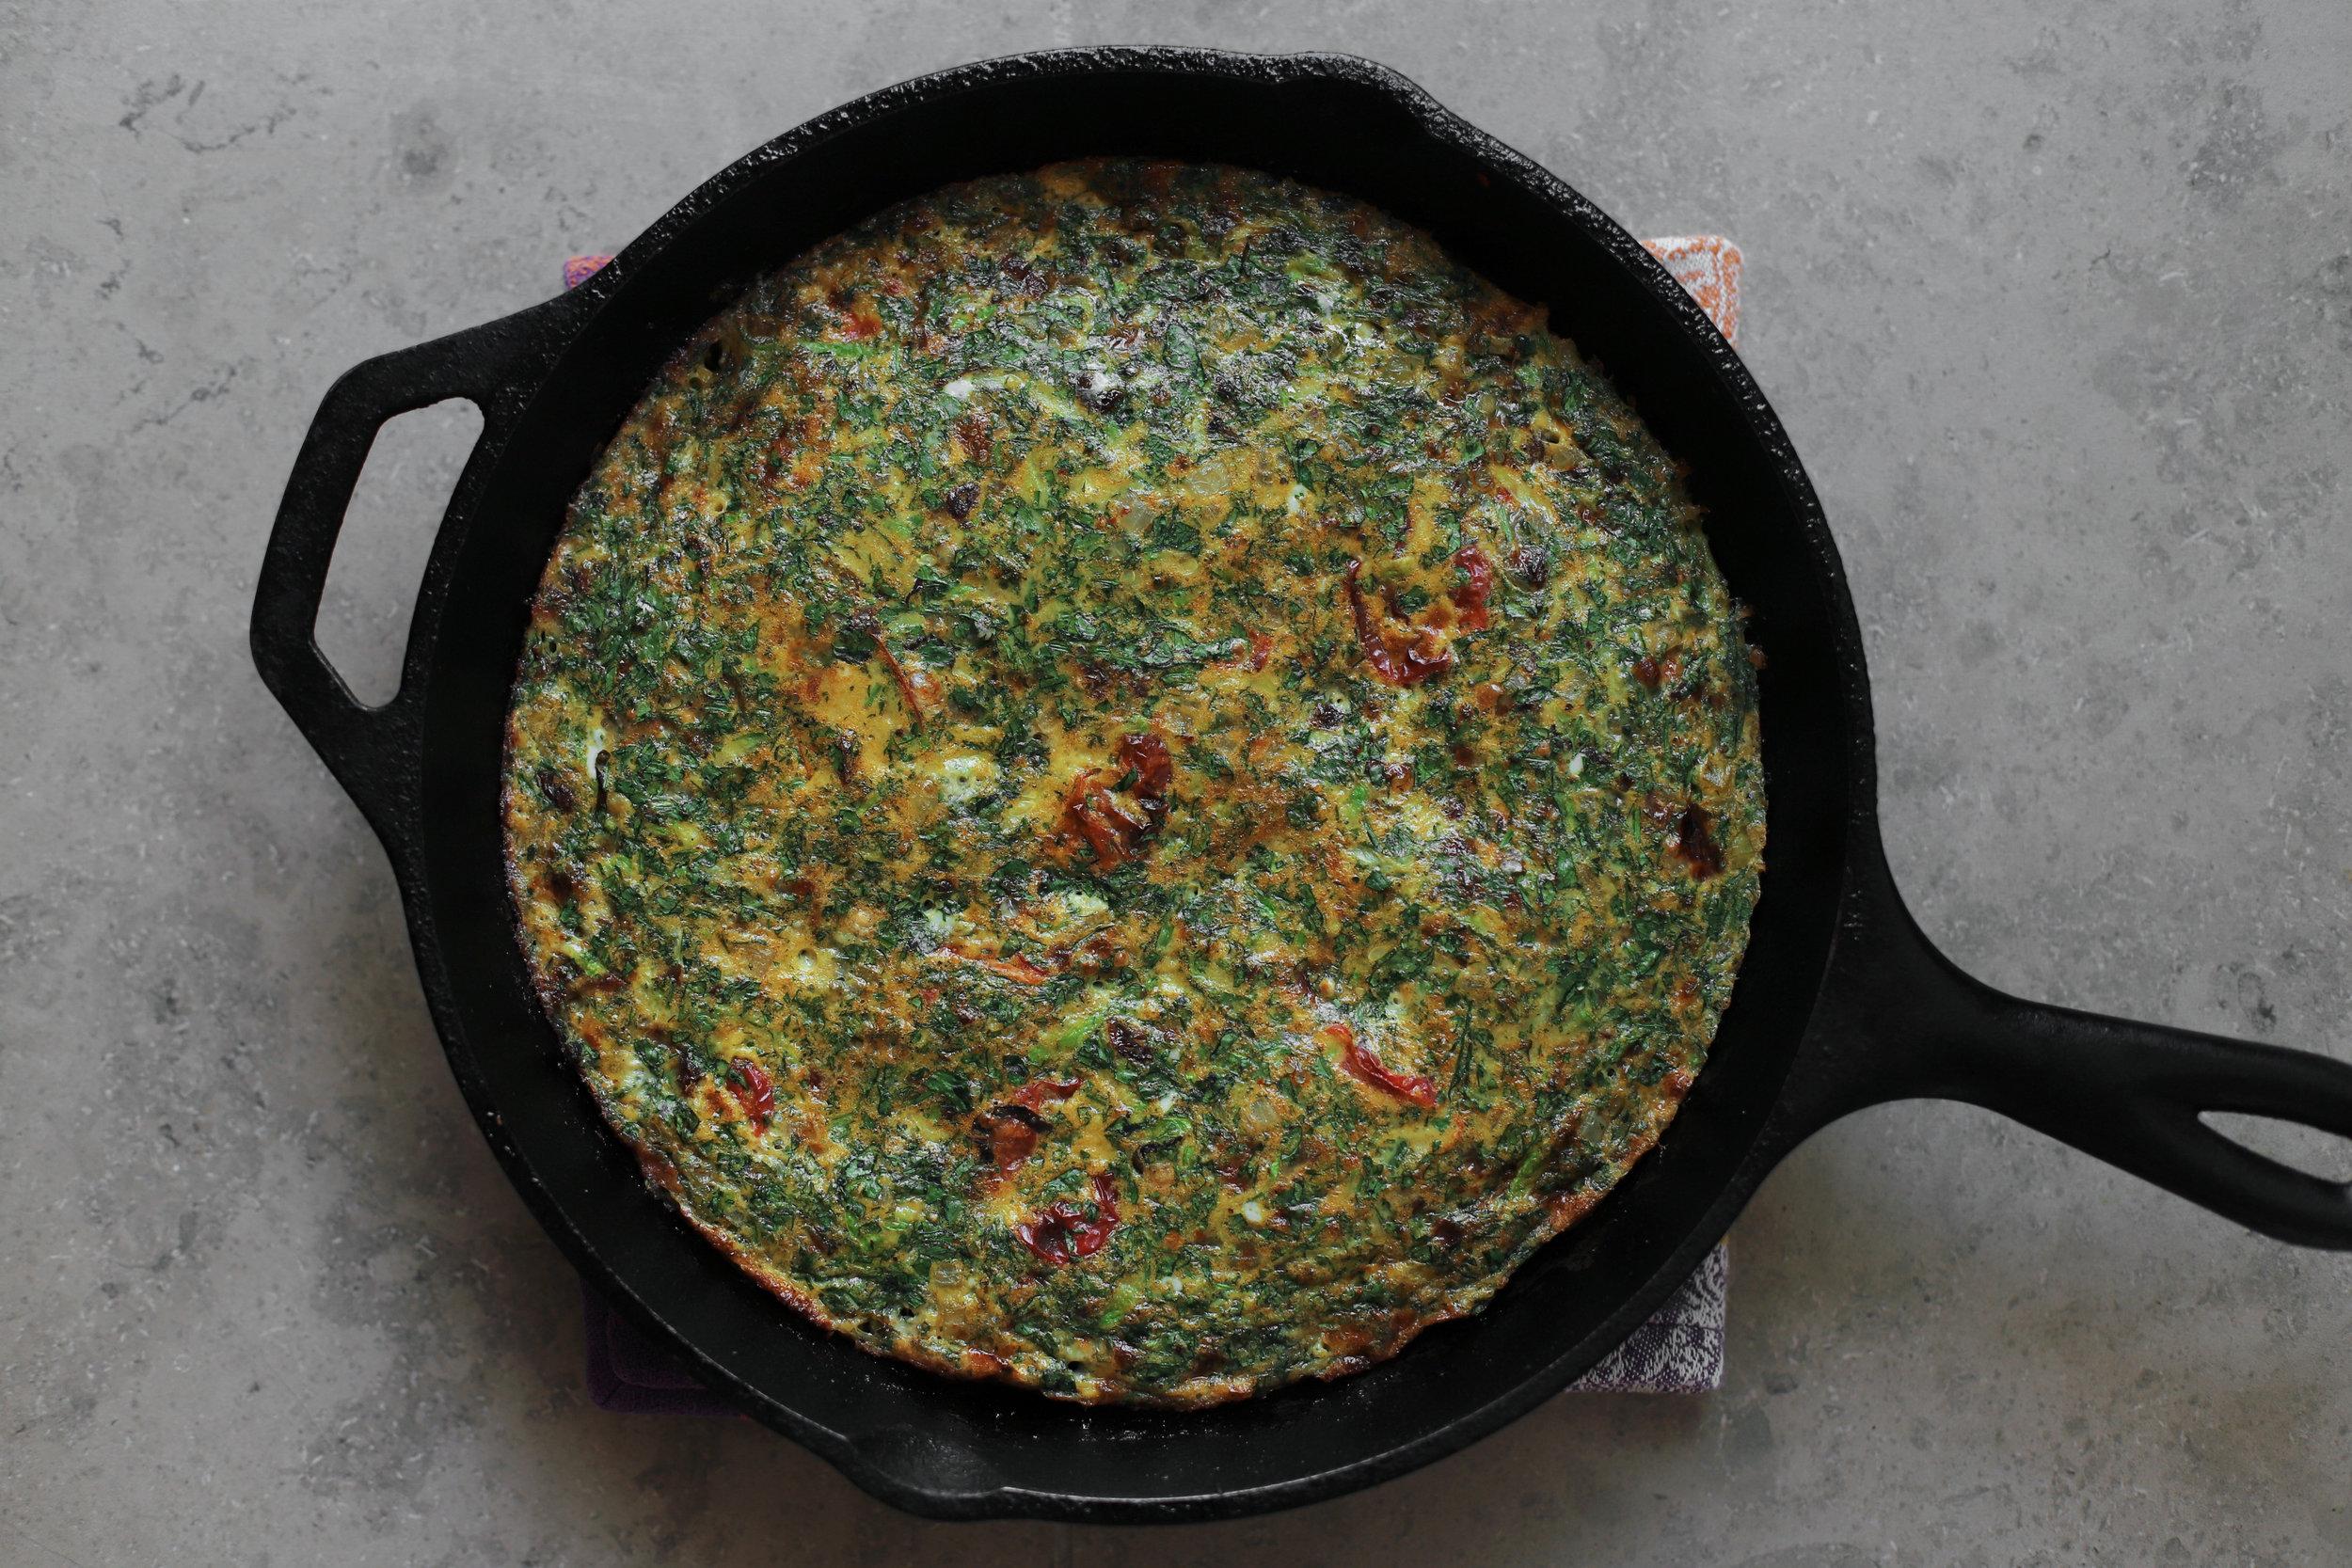 kuku sabzi-inspired frittata